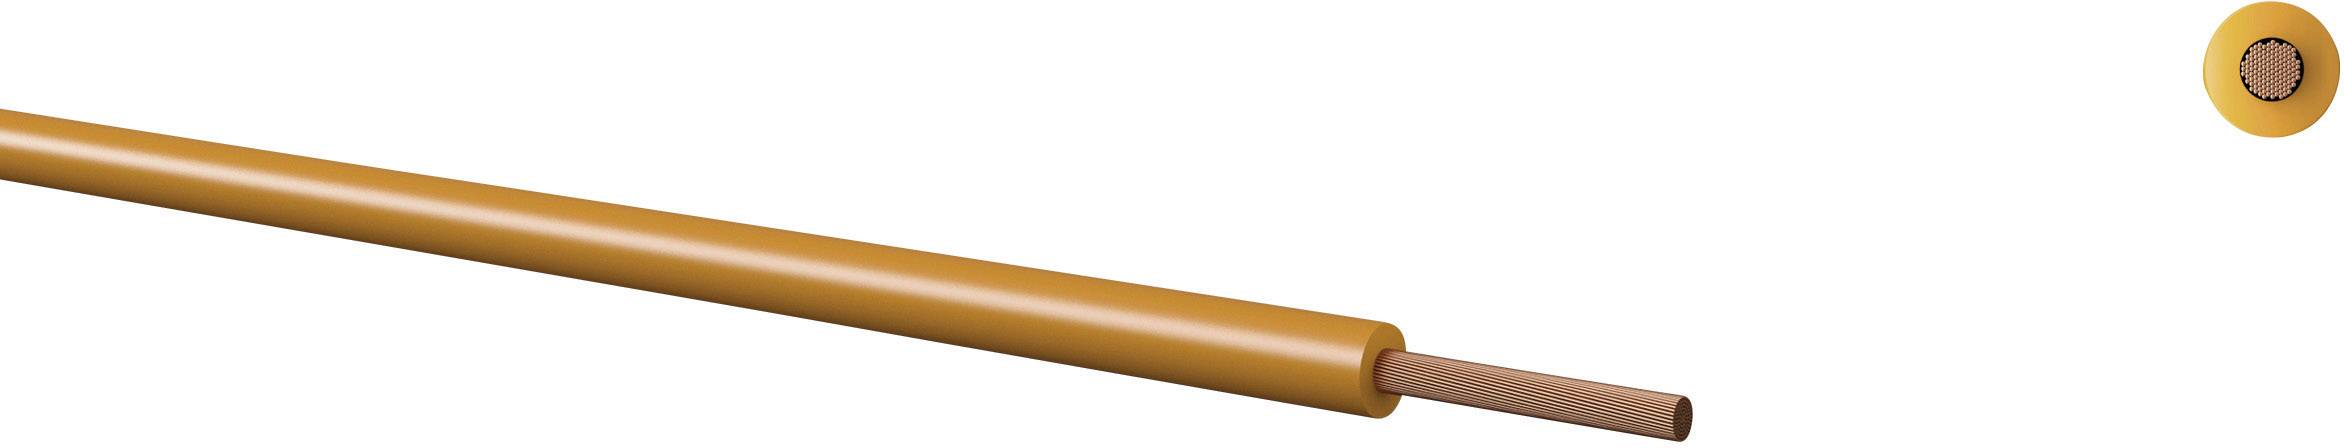 Pletenica LiFY 1 x 0.75 mm, rumena Kabeltronik 160107504 cena za meter